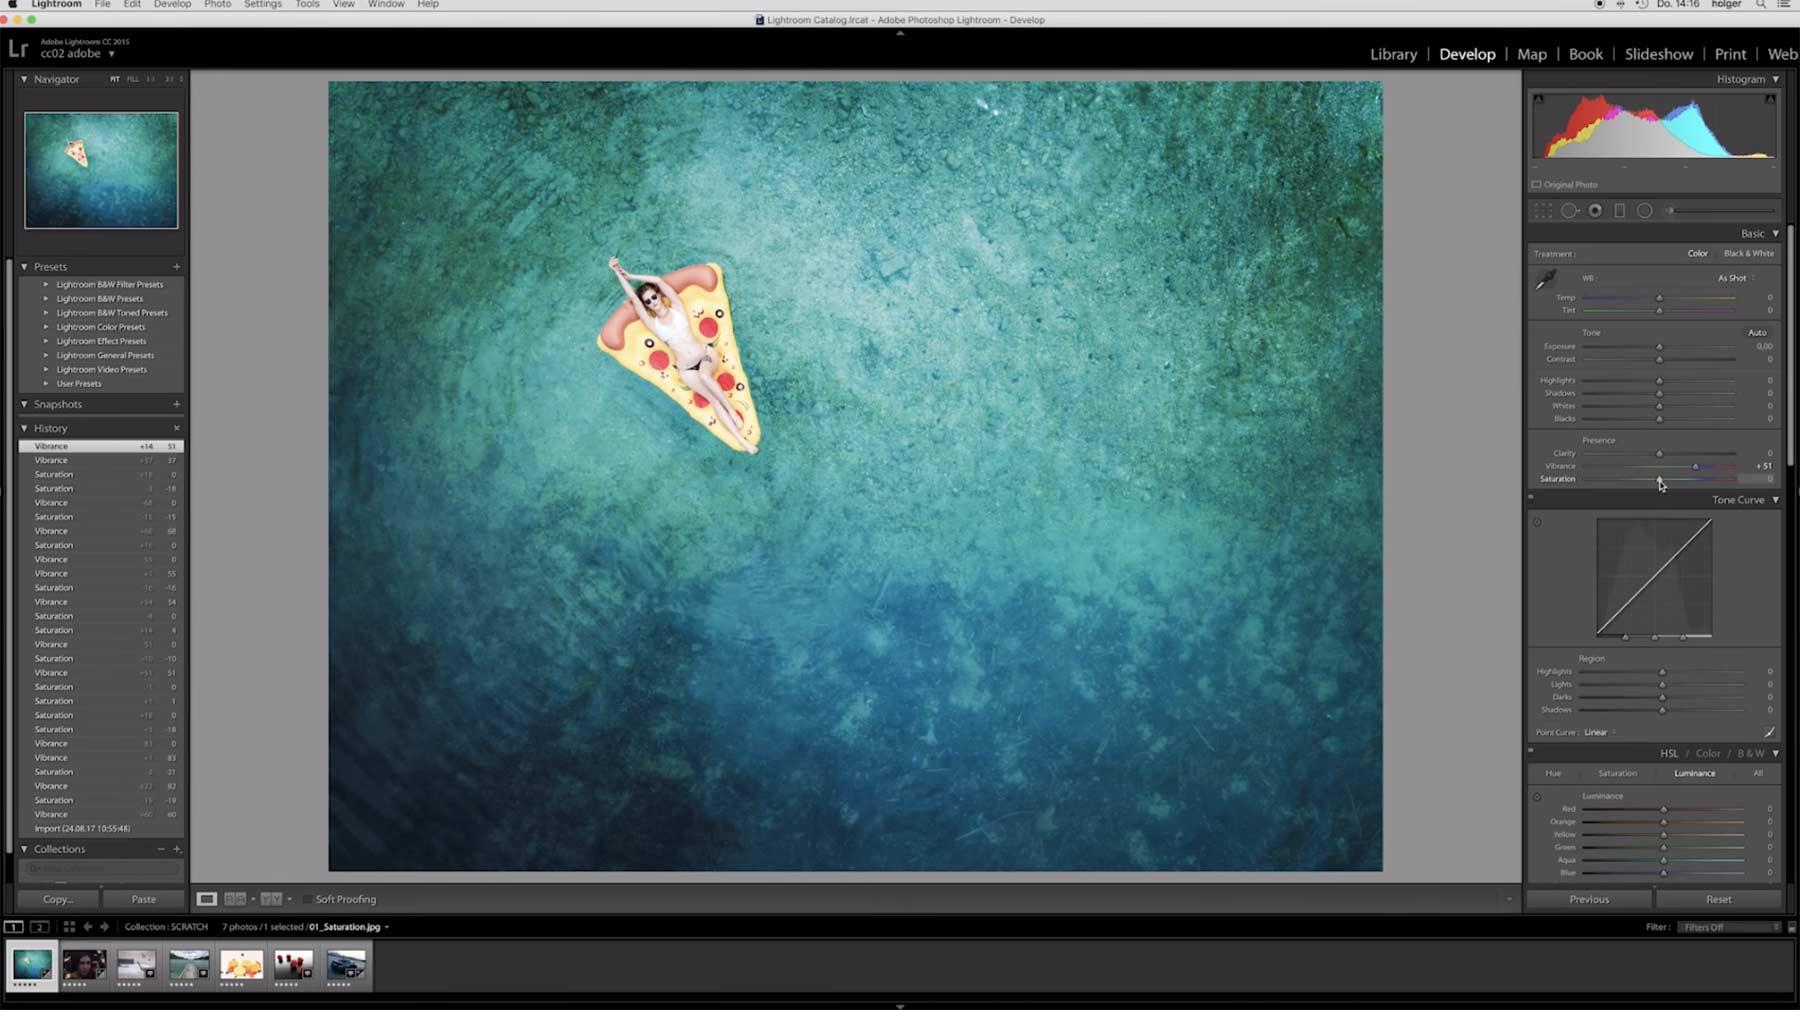 Nützliche Tipps zur digitalen Bildbearbeitung tipps-zur-bildbearbeitung